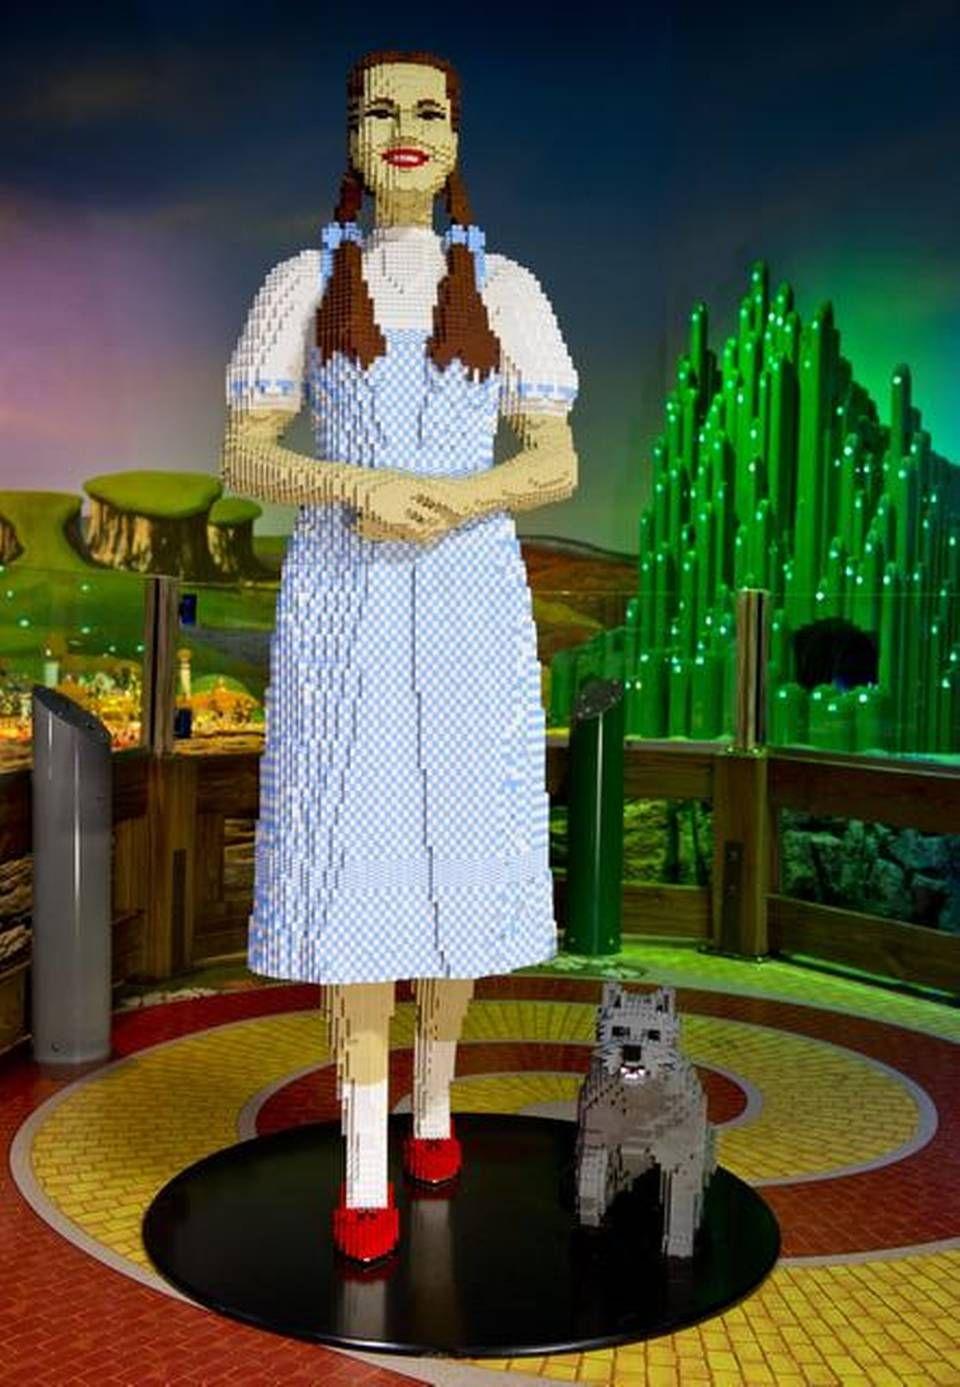 Life-size Dorothy and Toto at Legoland Discovery Center in Kansas City via The Kansas City Star